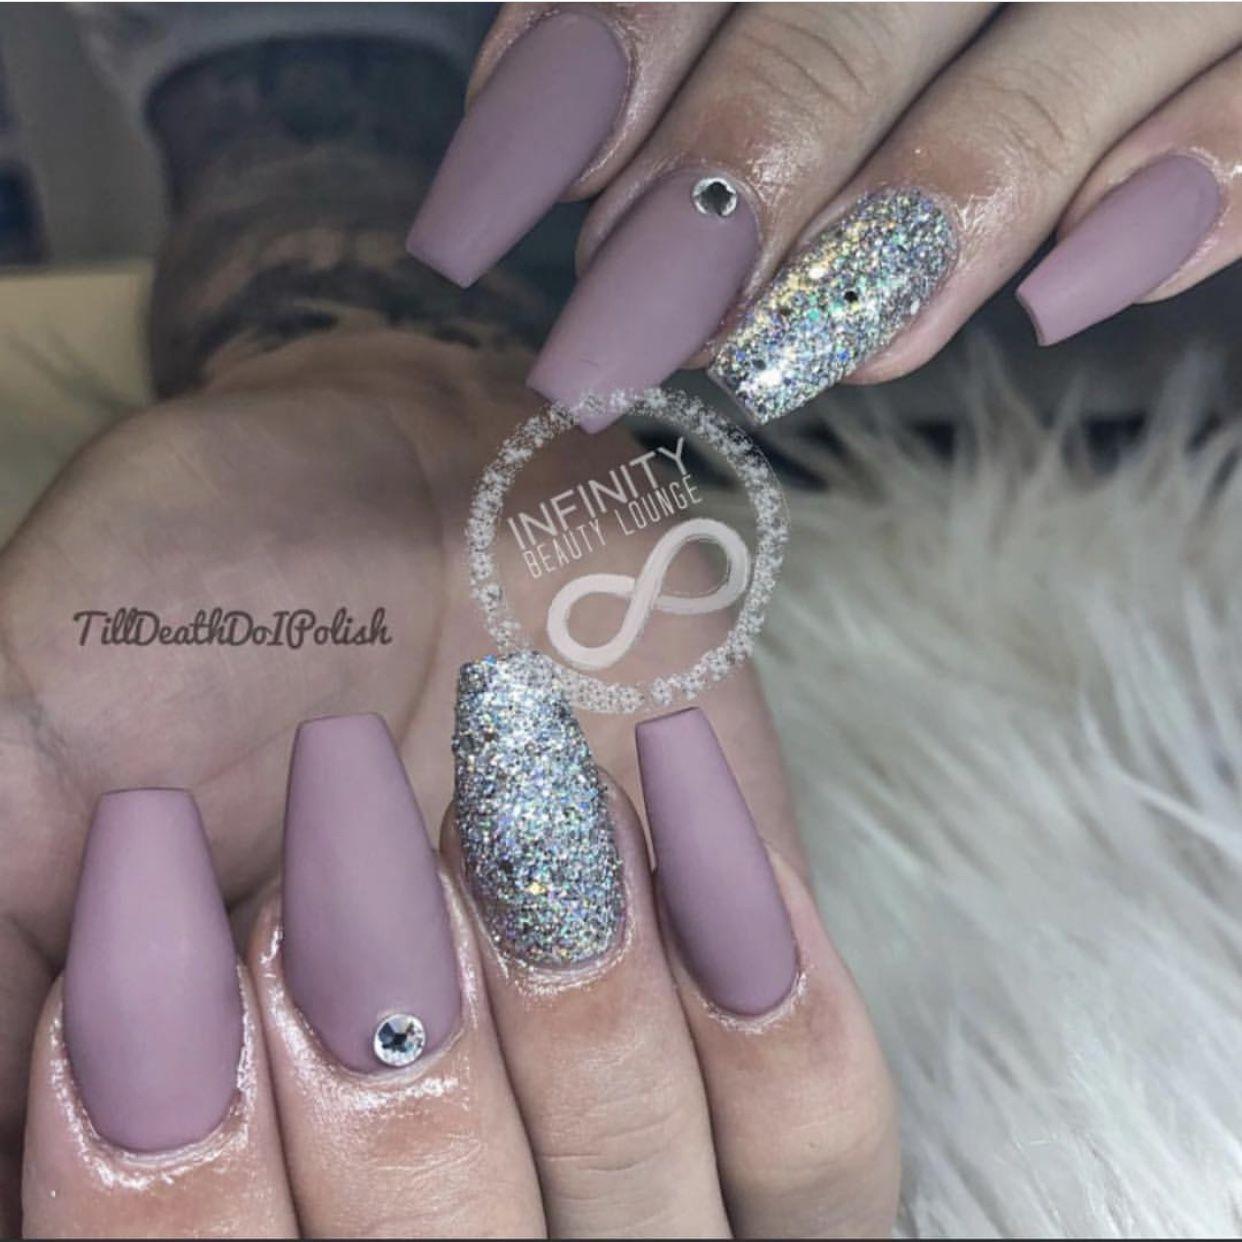 Infinity Beauty Lounge Jax Gel French Manicure Pink Manicure Manicure